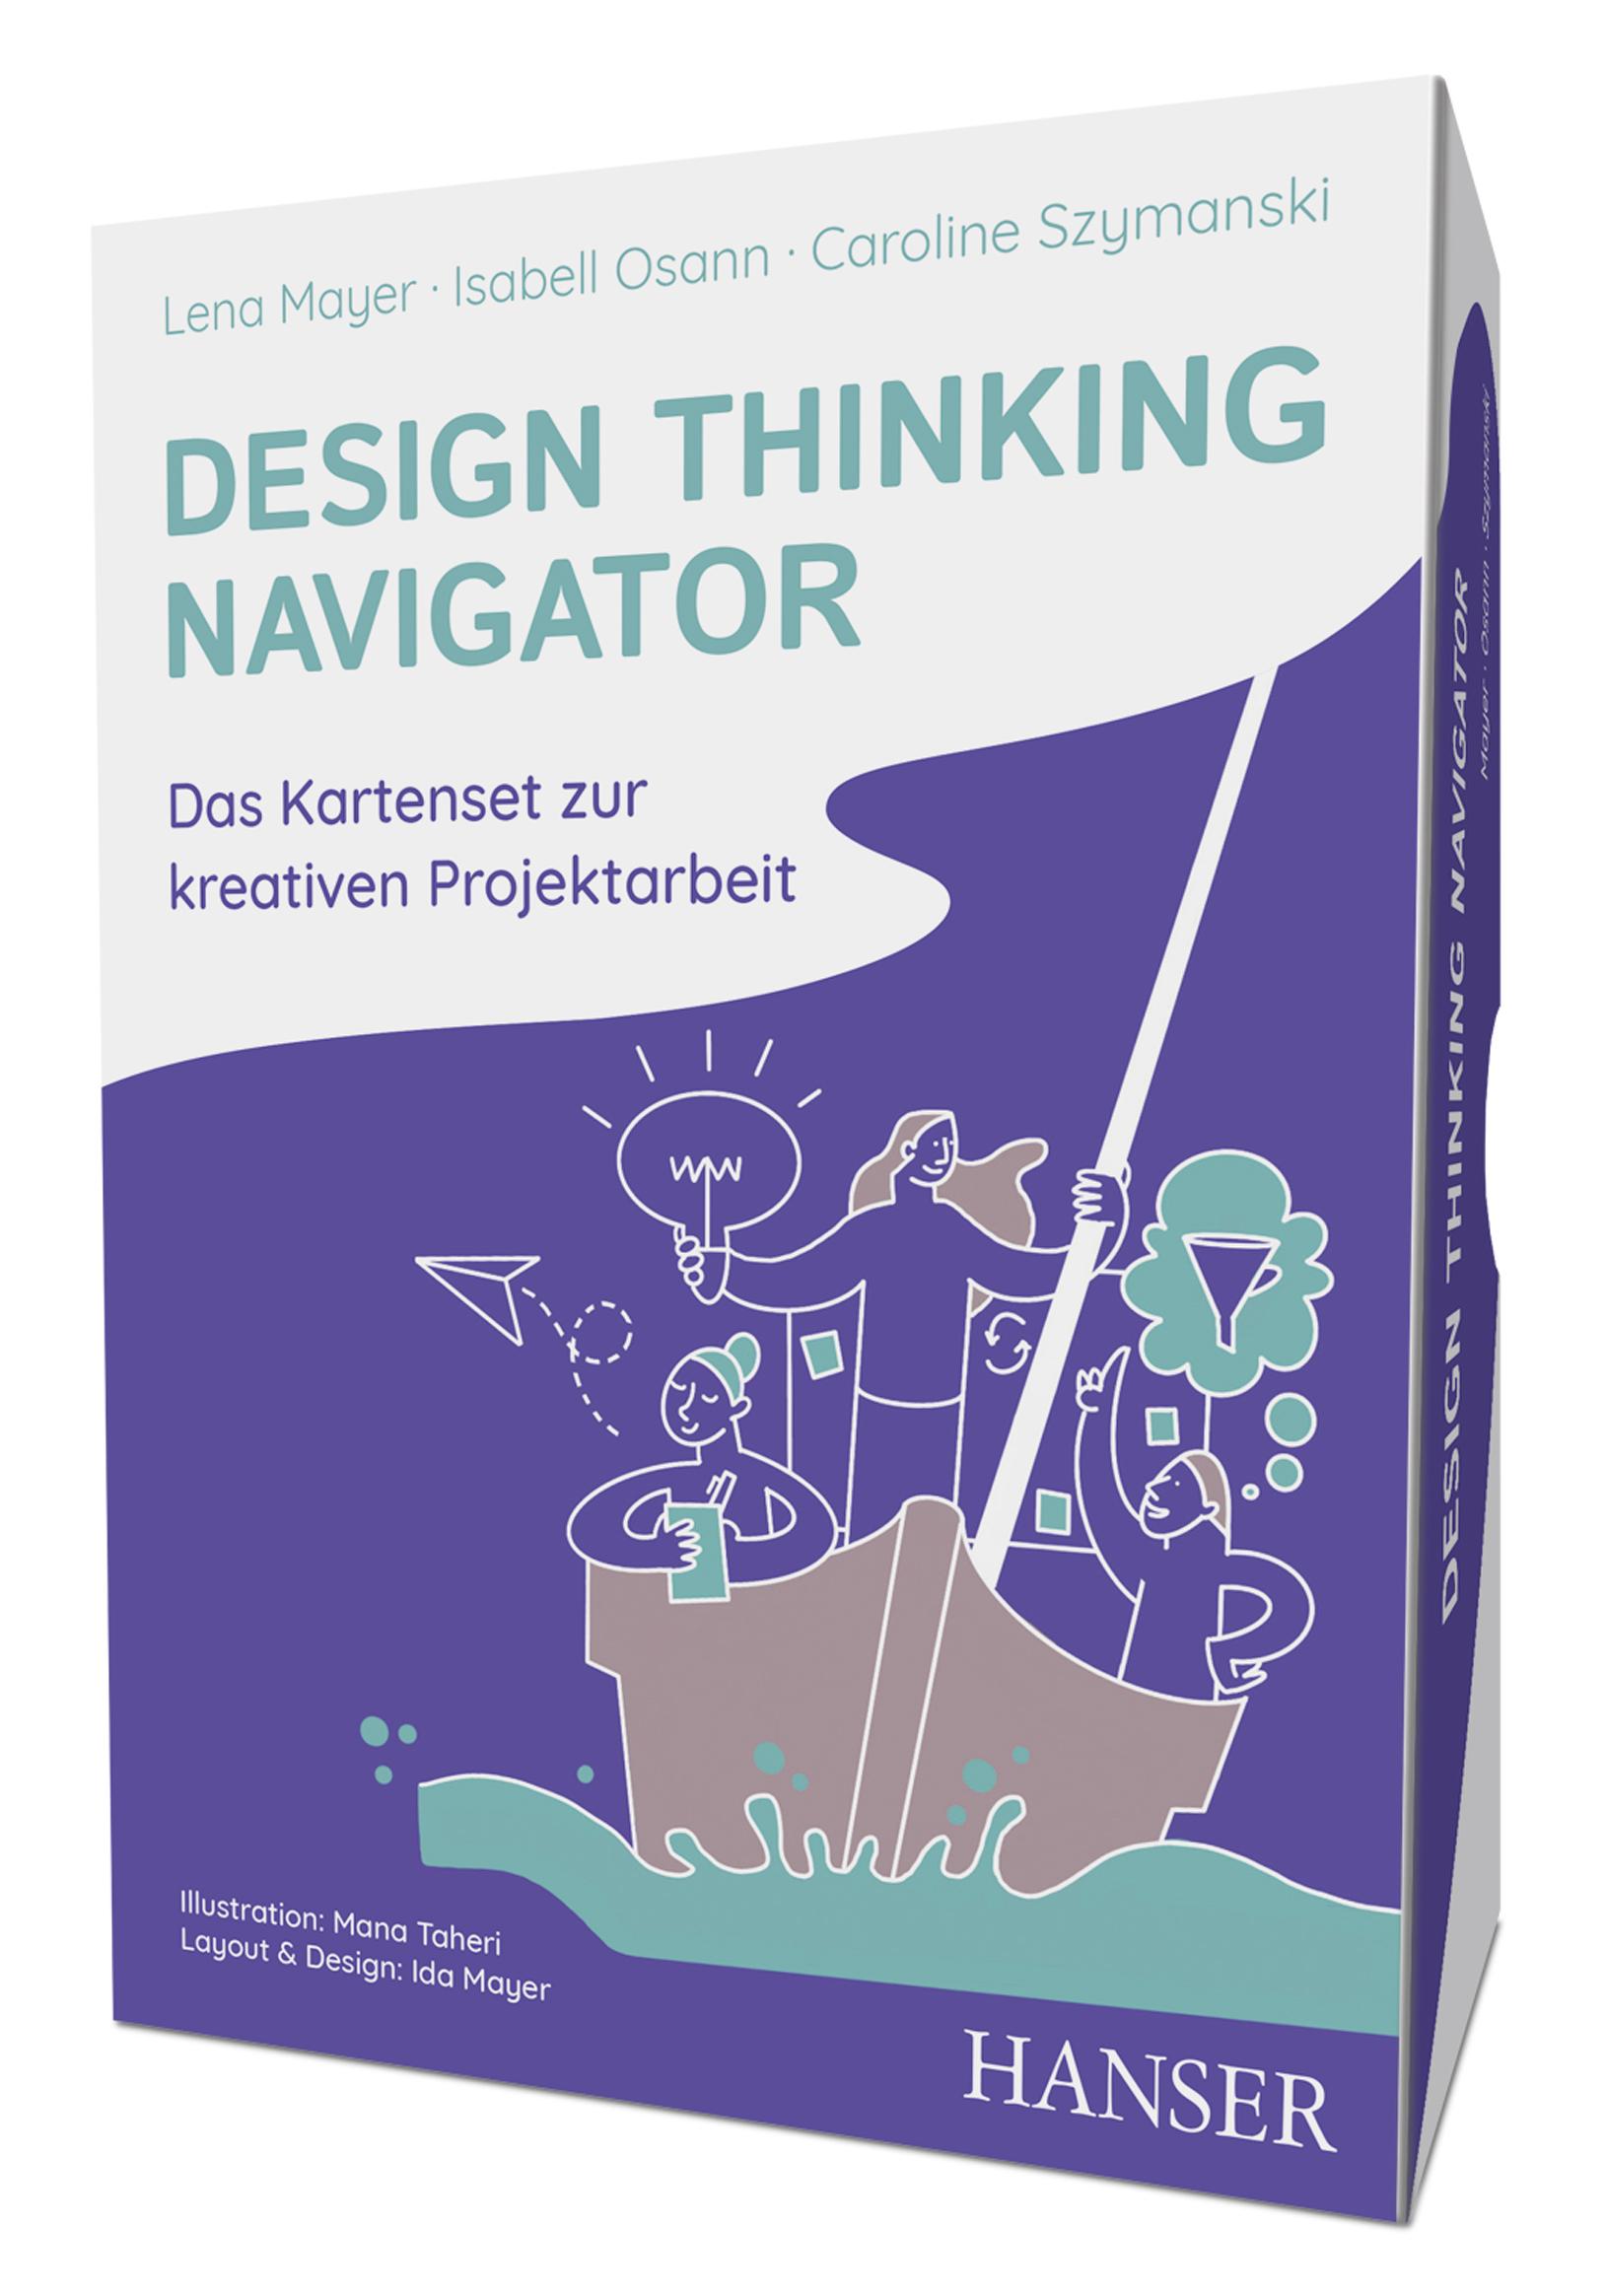 Mayer, Osann, Szymanski, Taheri, Design Thinking Navigator, 978-3-446-46208-3